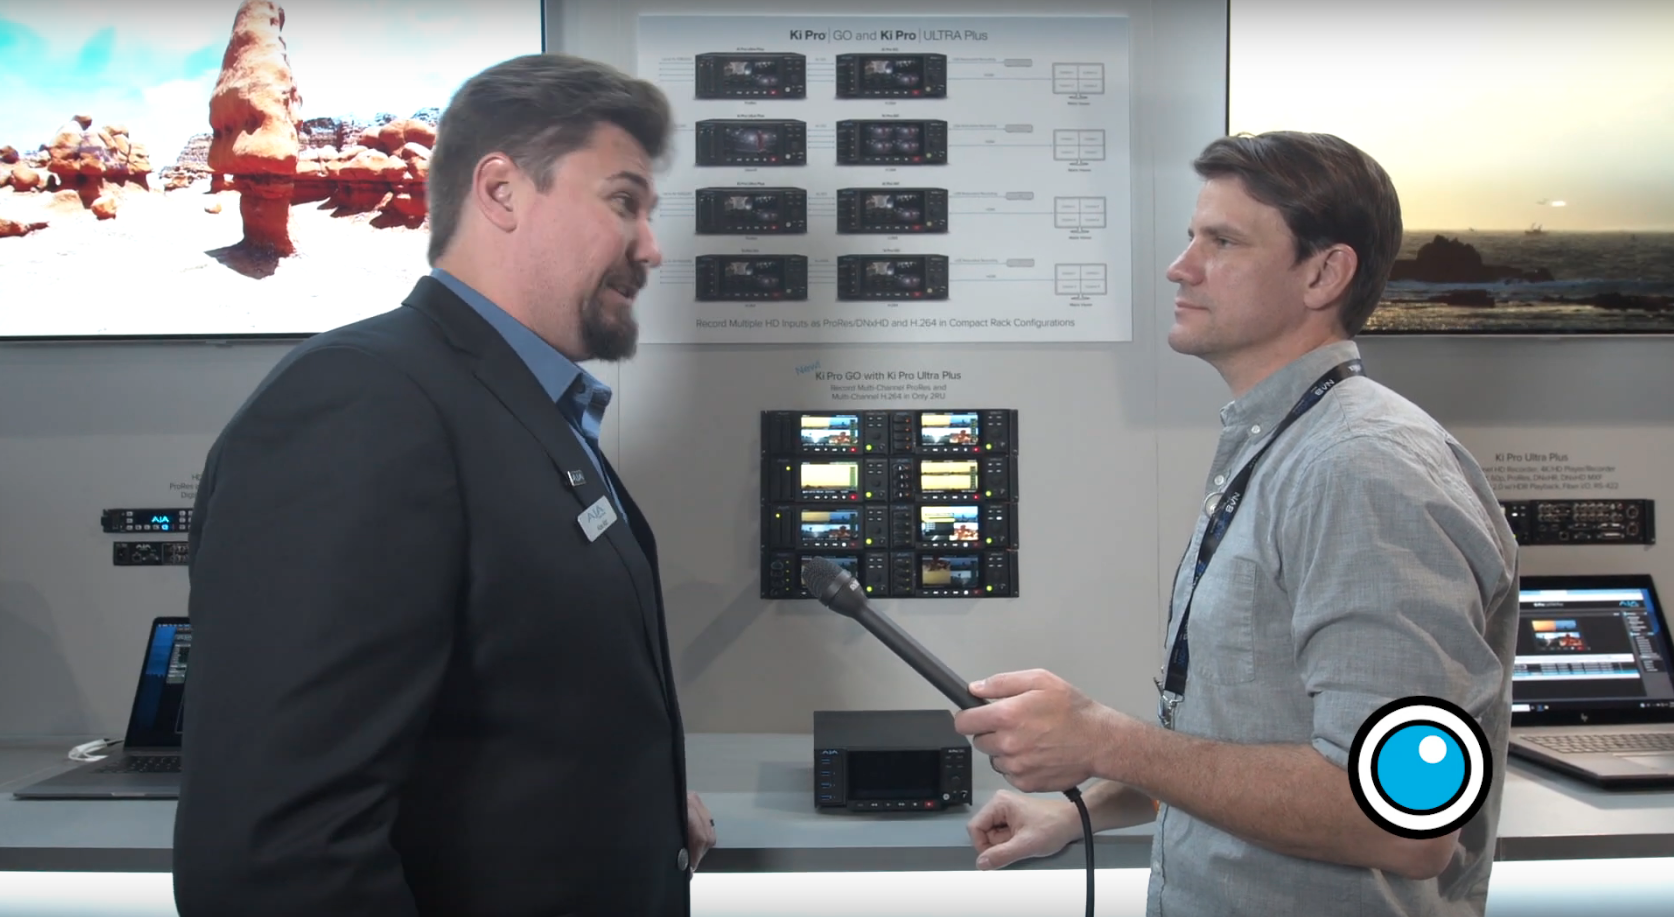 NAB 2019: AJA Ki Pro GO Multi-Channel H.264 Recorder/Player by Brian Hallett